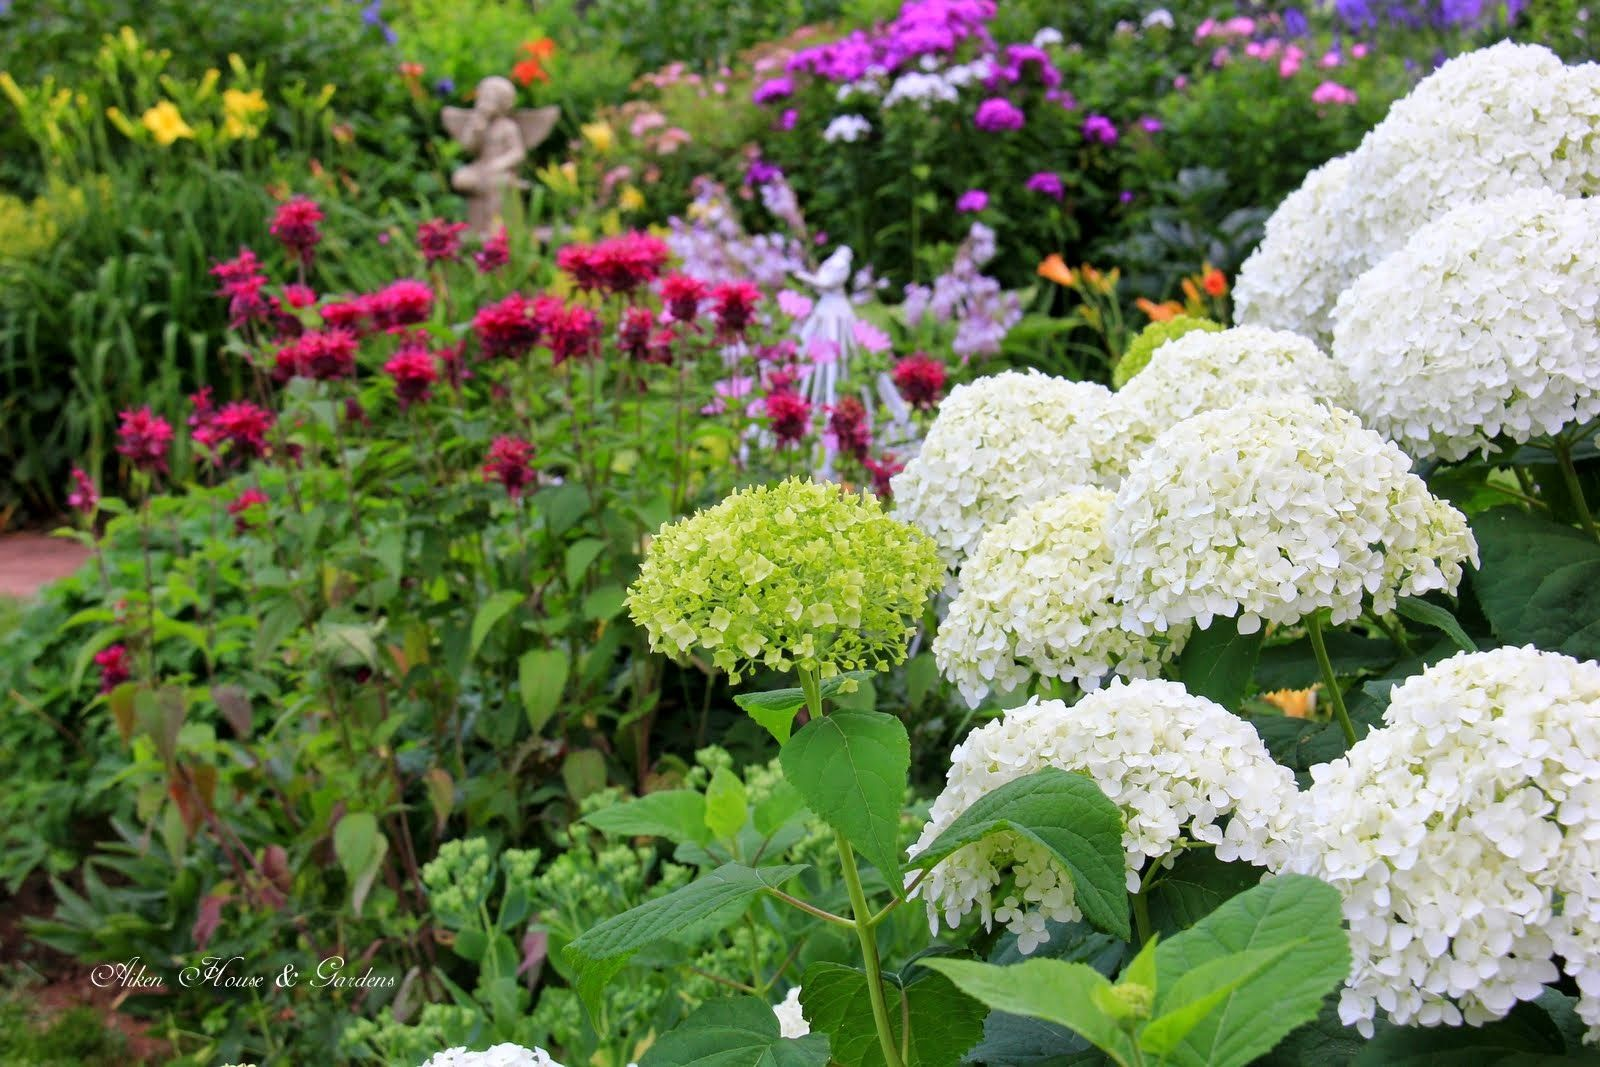 Aiken House Gardens A Tour Around Our Mid August Garden Garden